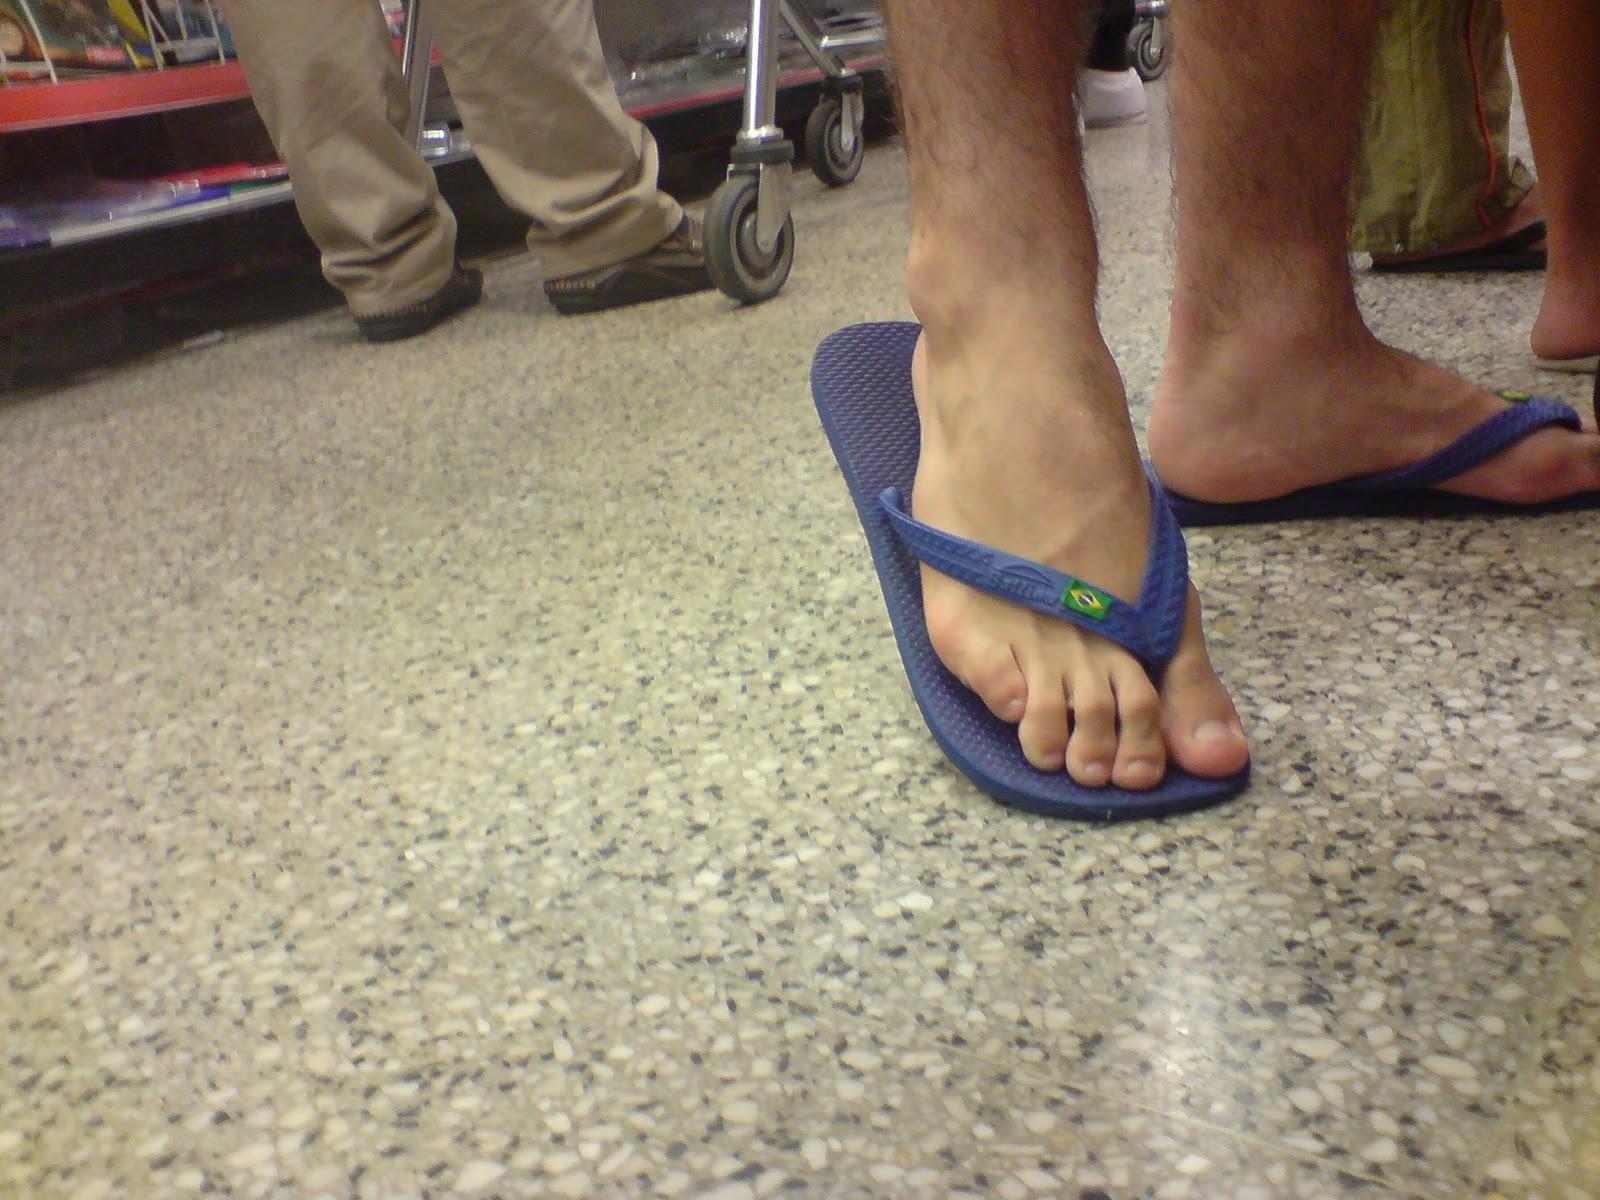 Beaux pieds de mecs en tongs Gay skets - Leche mes skets